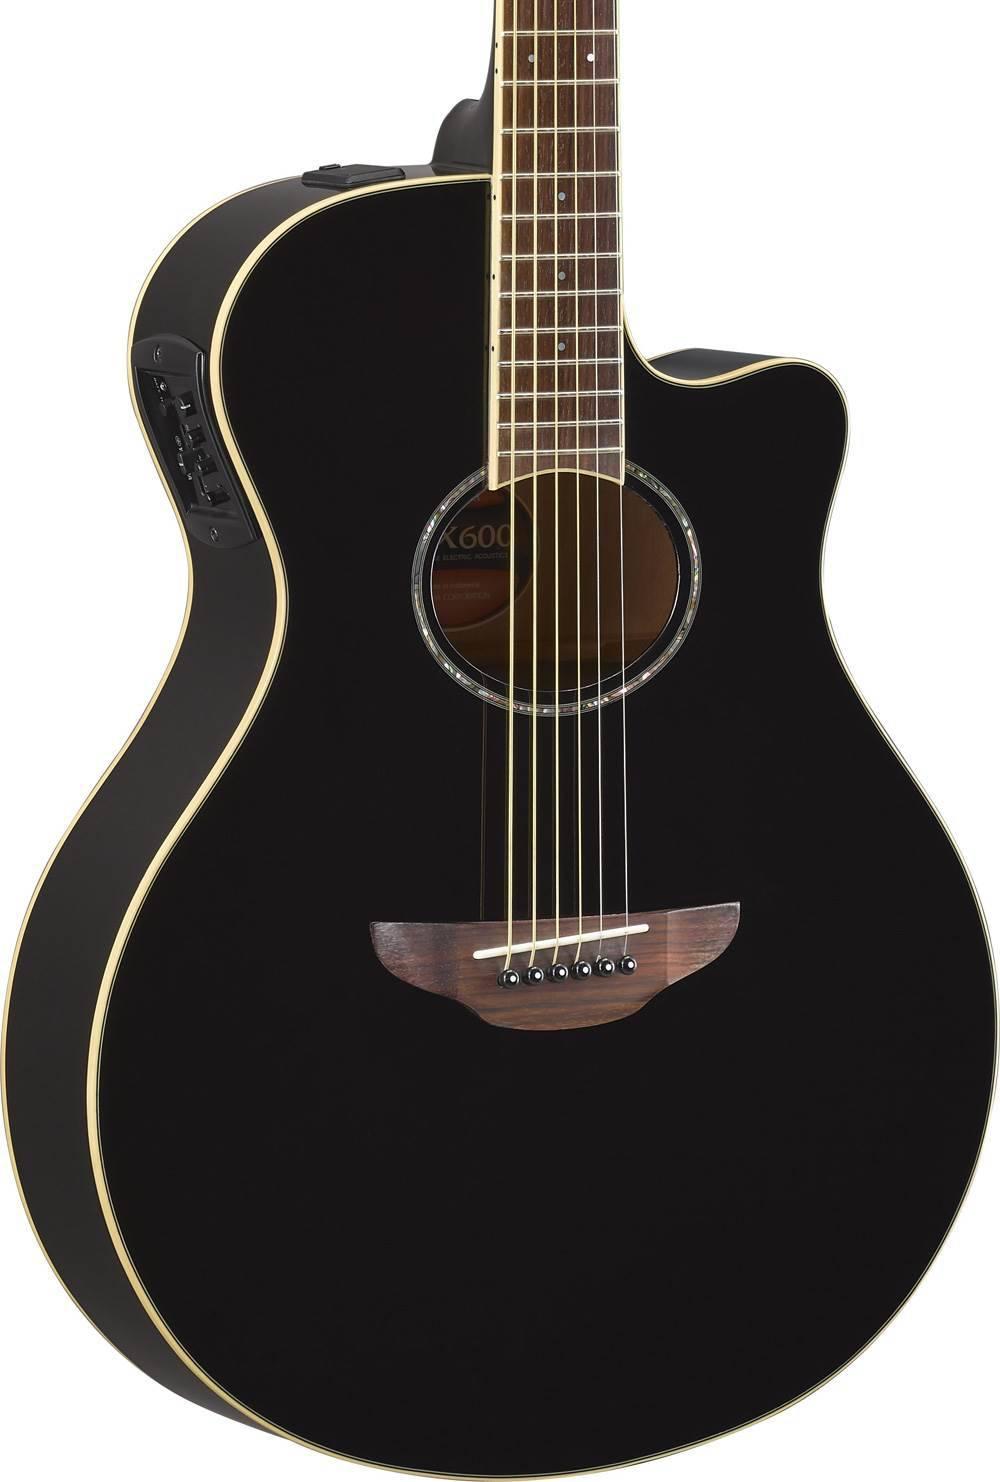 magnifique guitare yamaha apx 600 folk. Black Bedroom Furniture Sets. Home Design Ideas